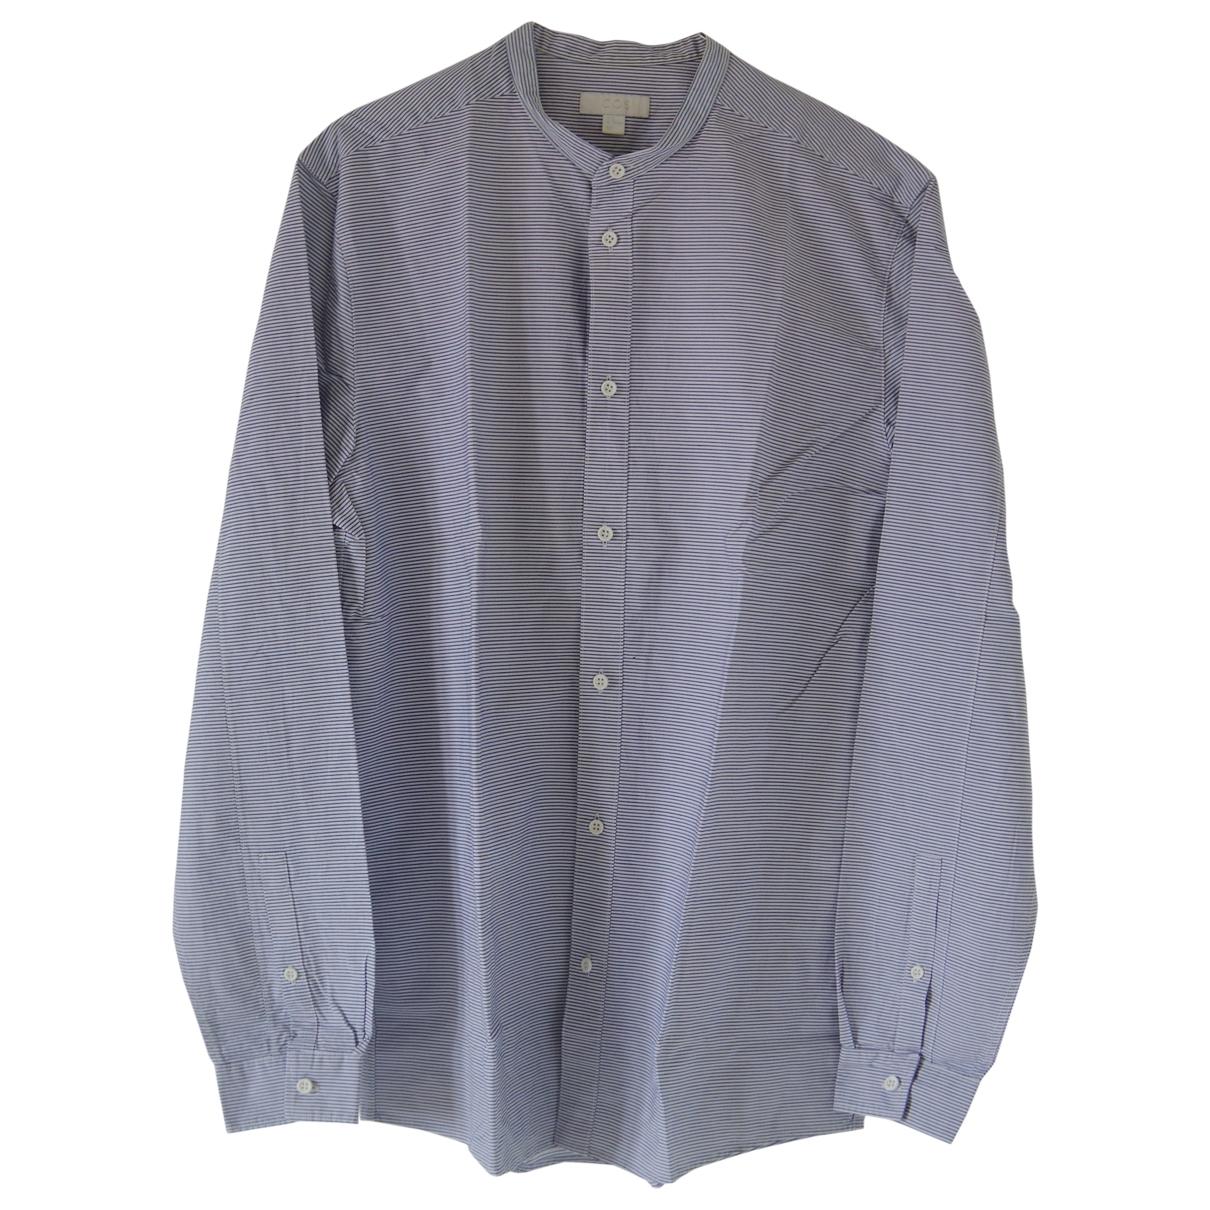 Cos \N Blue Cotton Shirts for Men M International